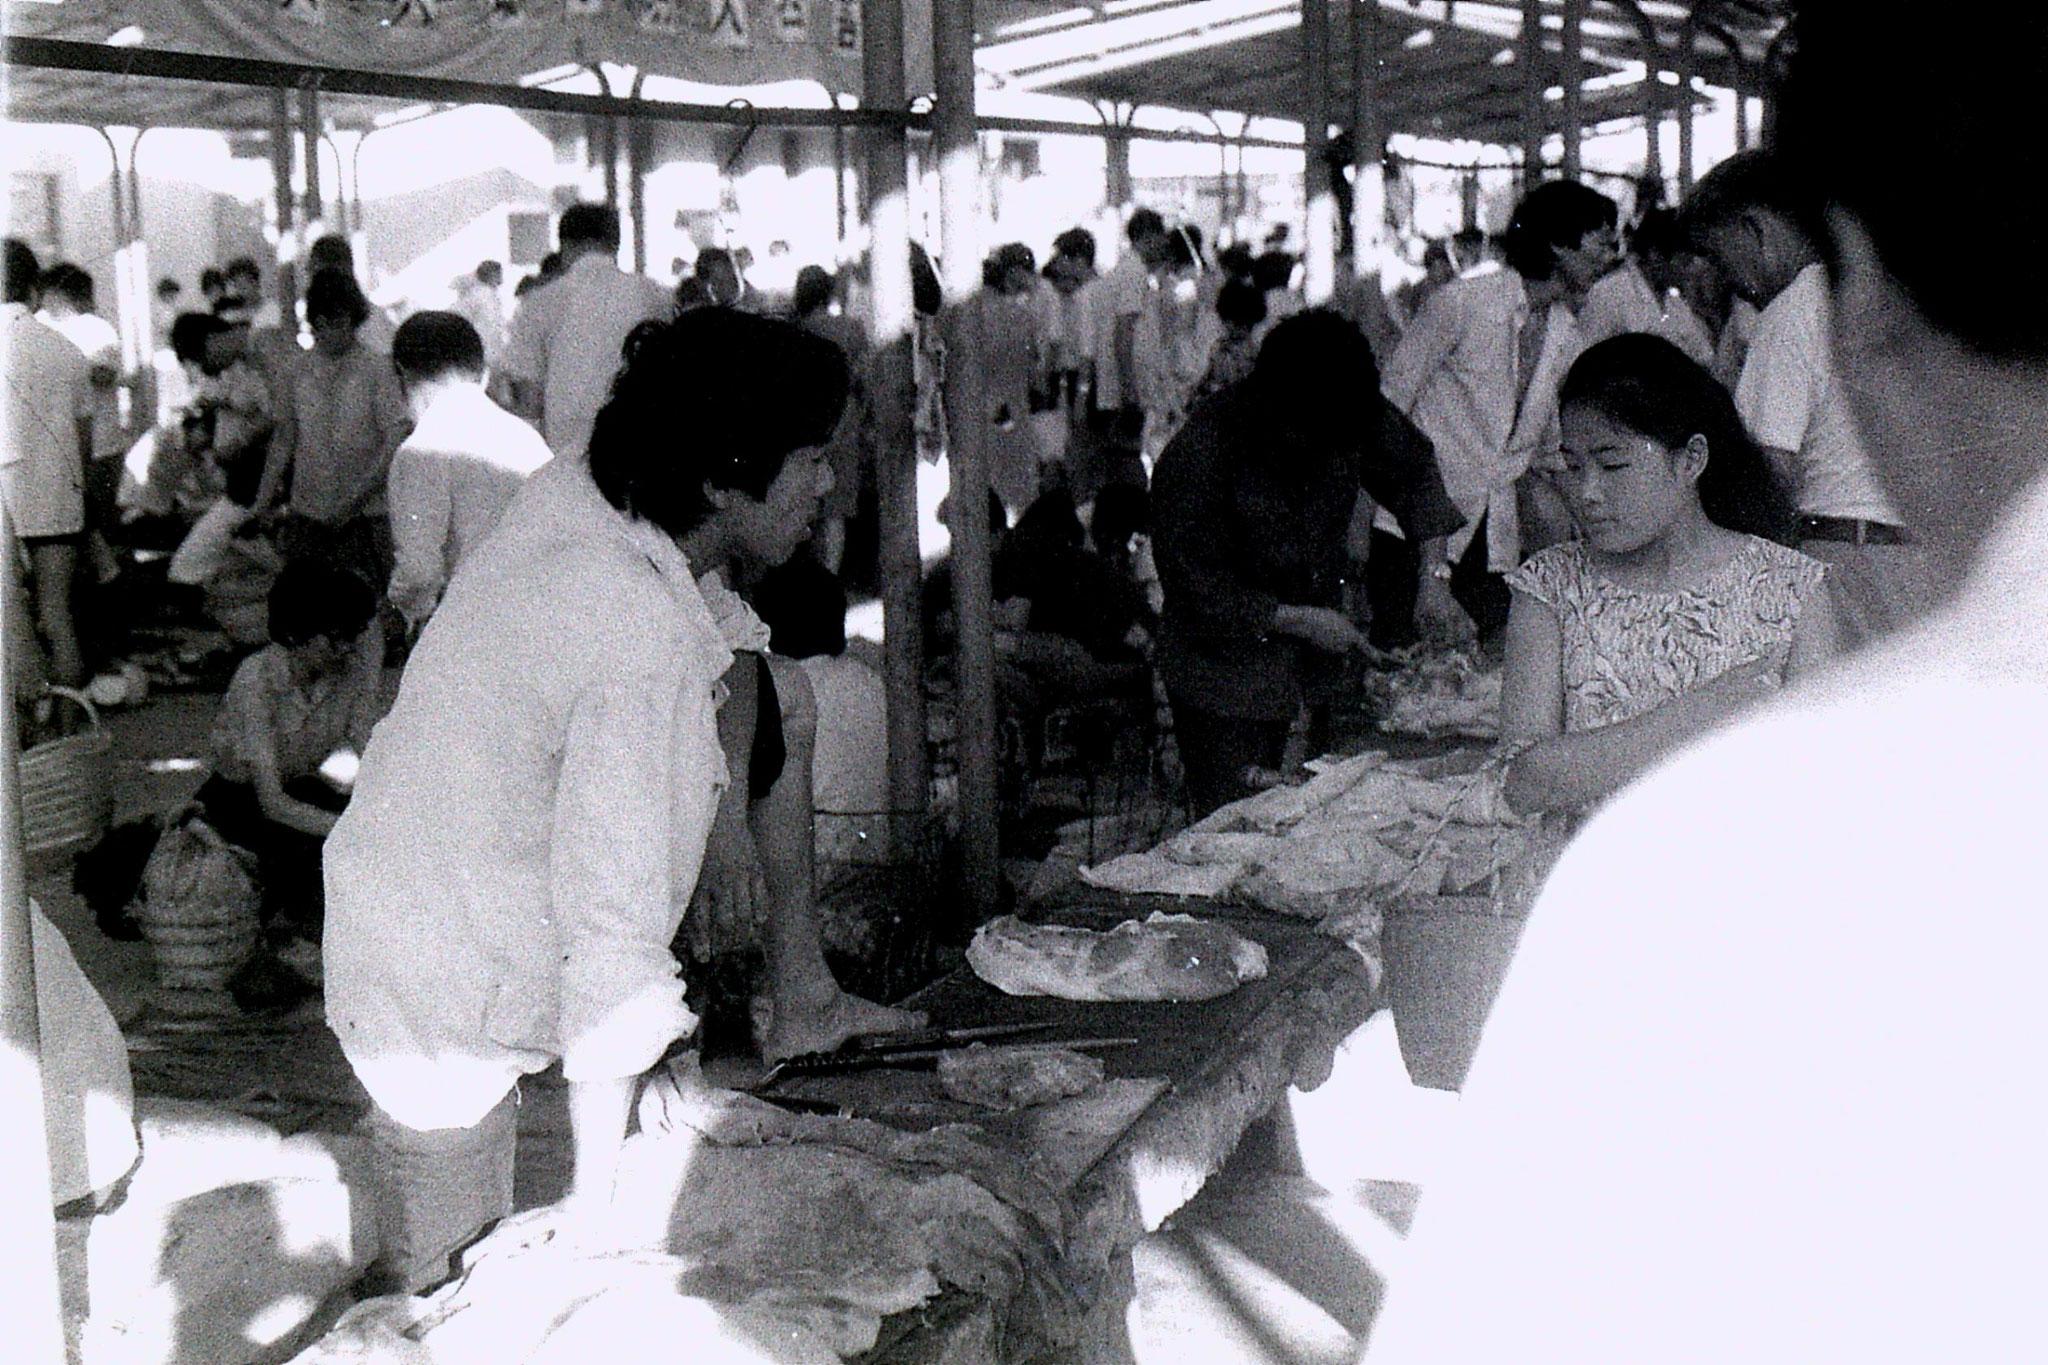 19/7/1989: 25: Zheda Free market